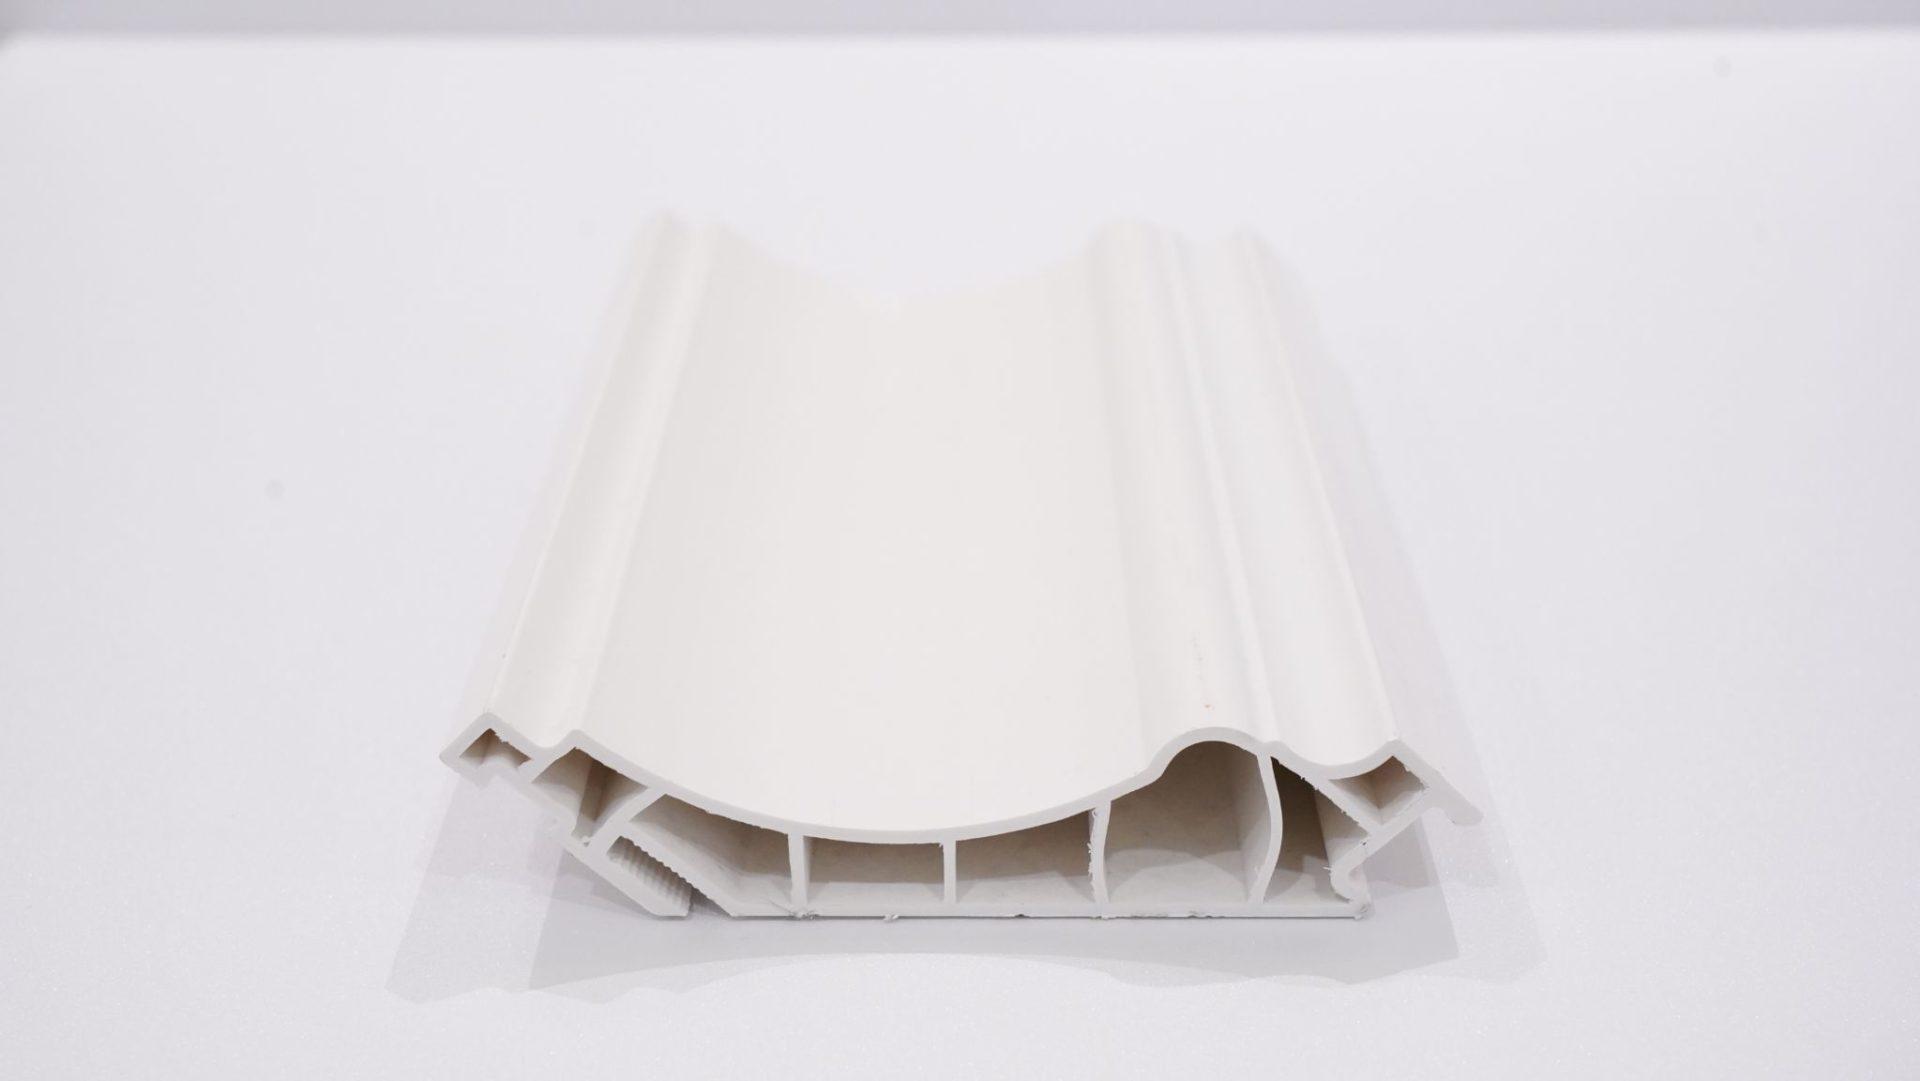 Phào cổ trần 135 - AnPro decorative molding